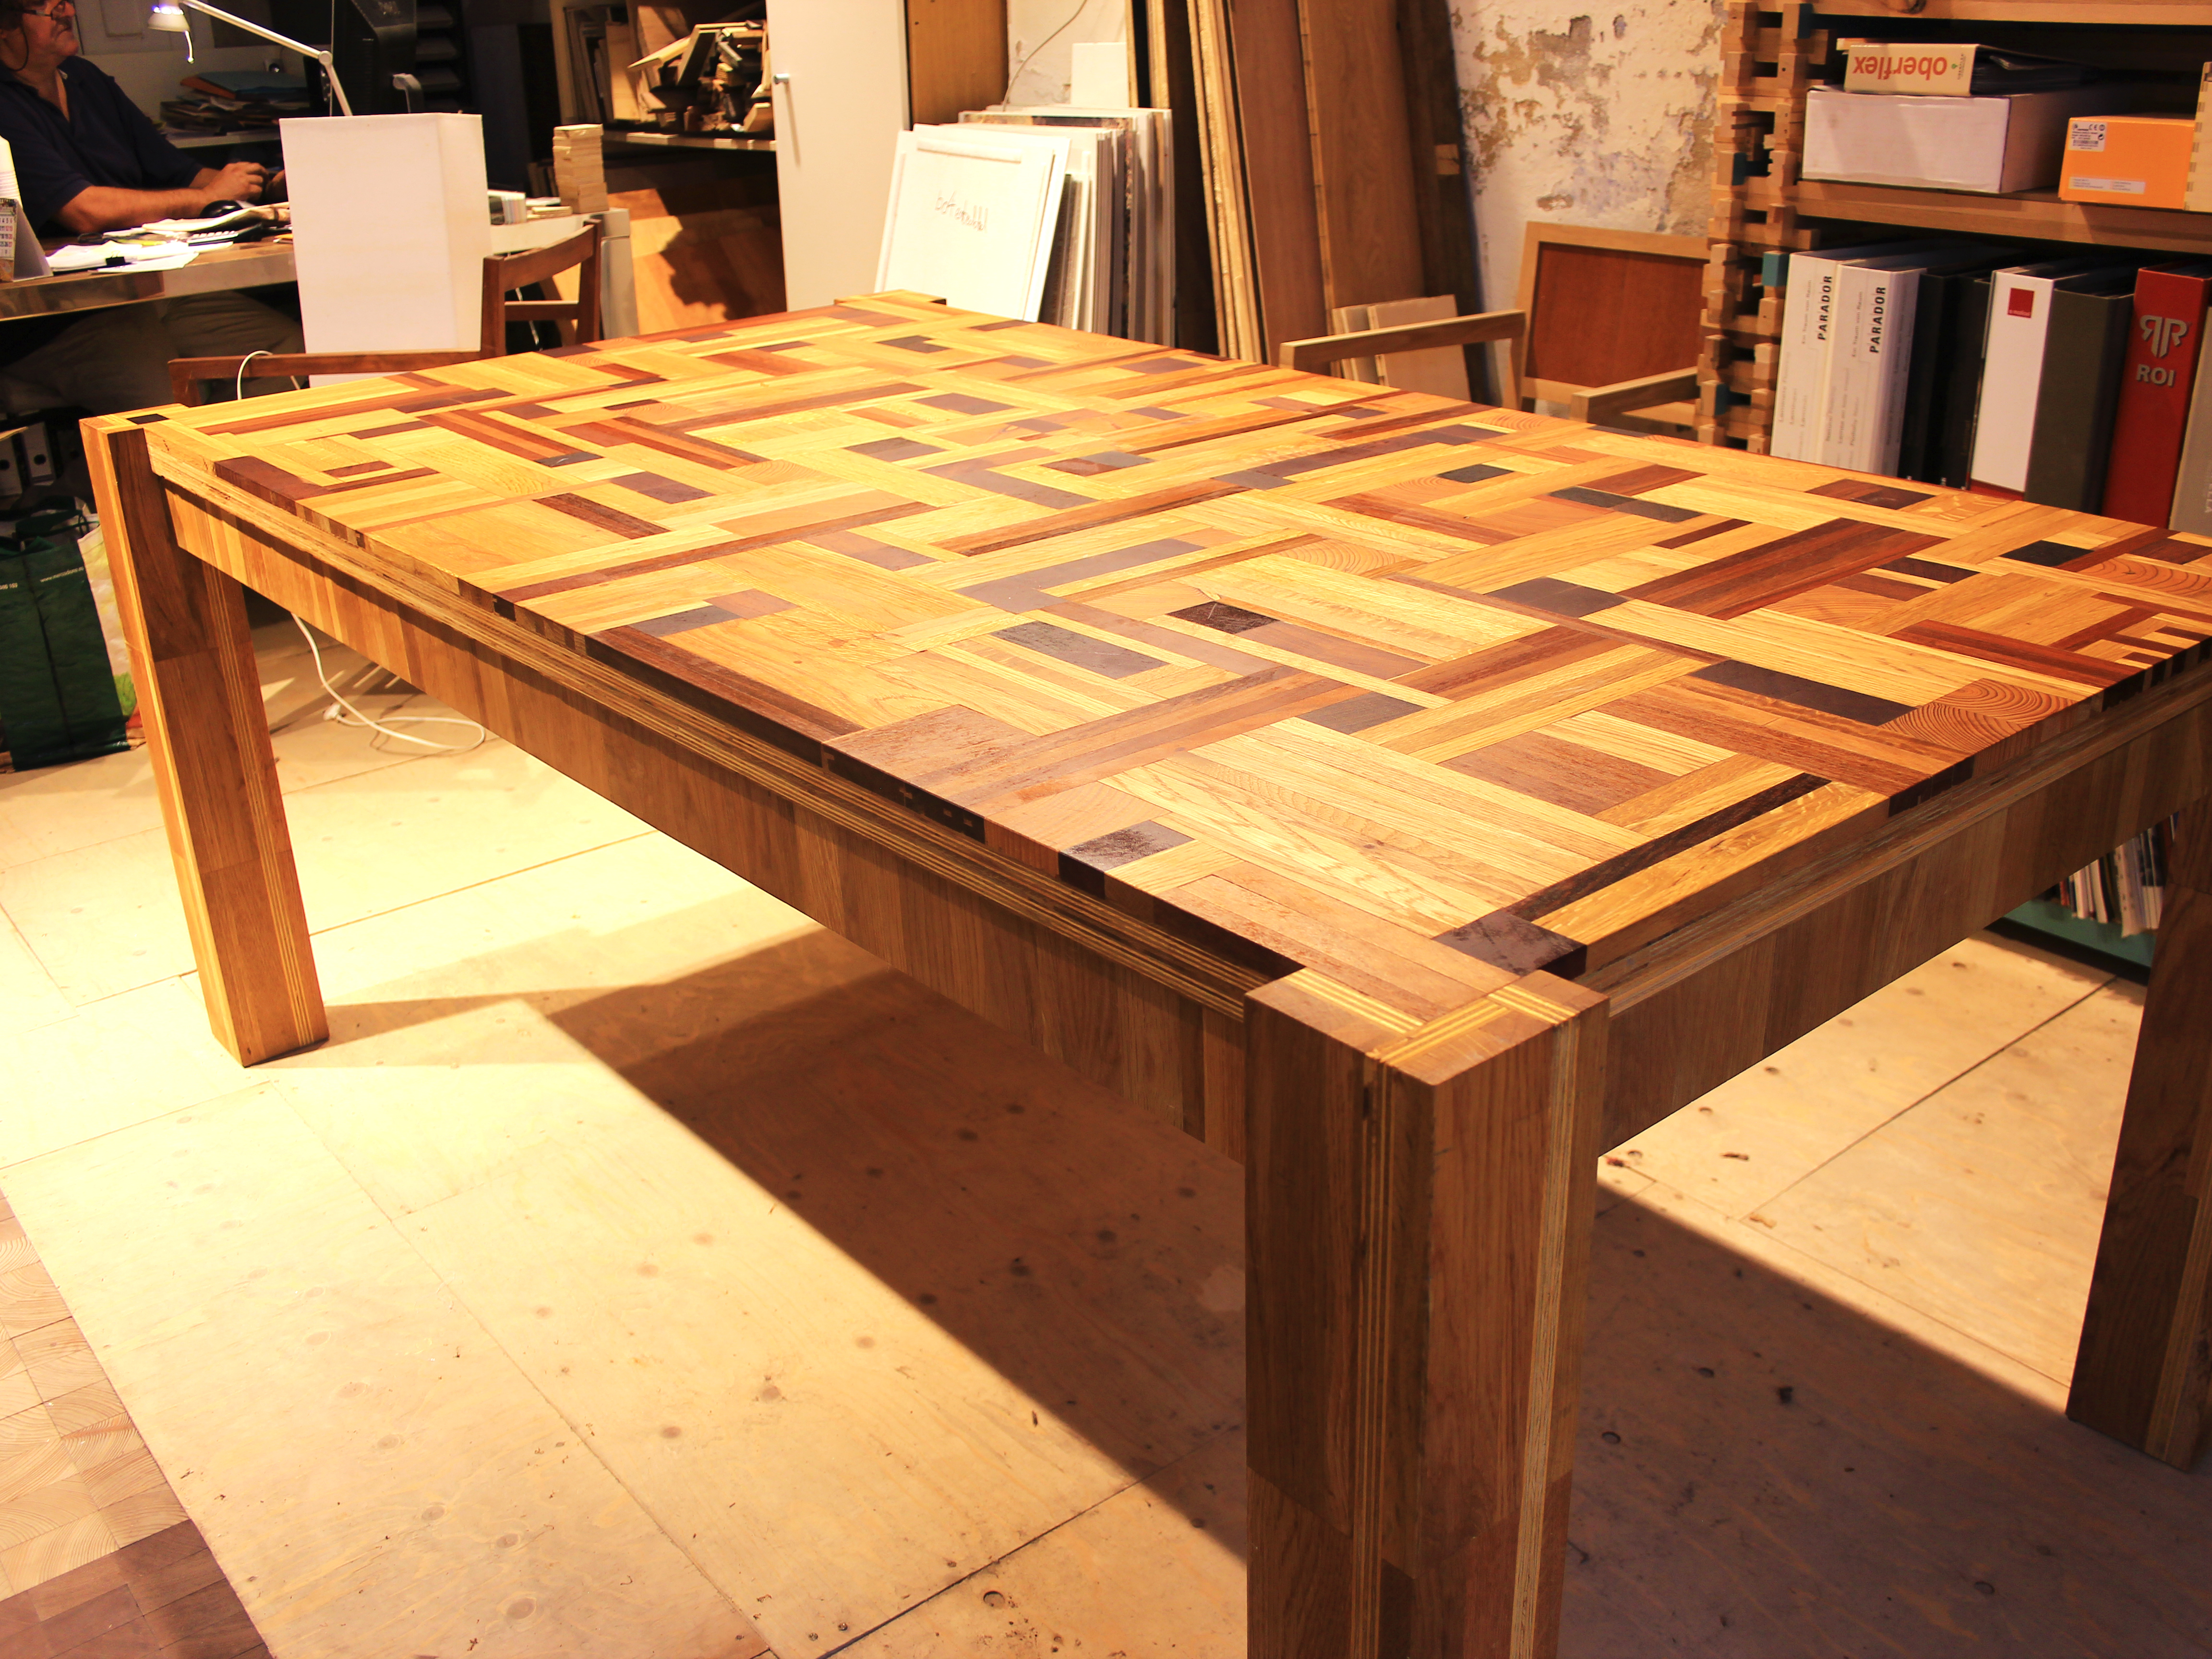 Dise O Geom Trico Muebles Refritos # Muebles Geometricos